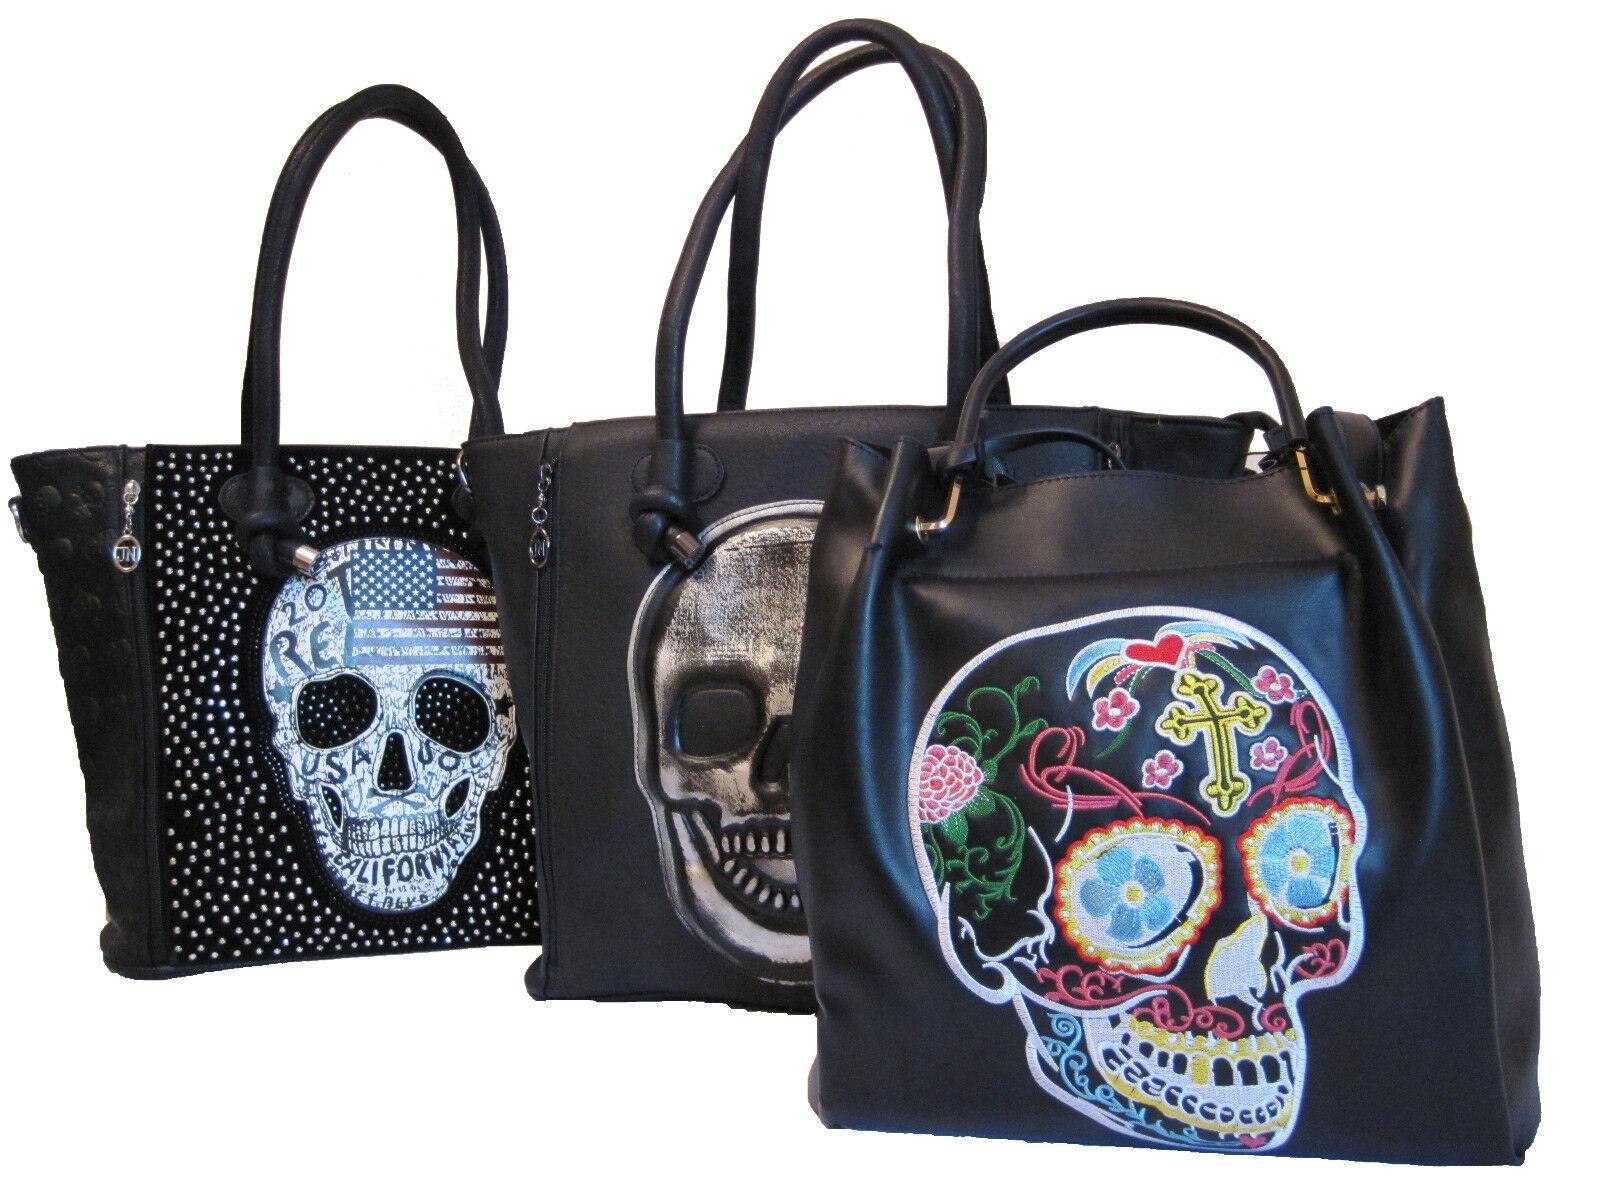 4737fac5e3ad3 Handtasche mit Totenkopf Schultertasche Damen Tasche Bunt Schwarz Skull  Nieten